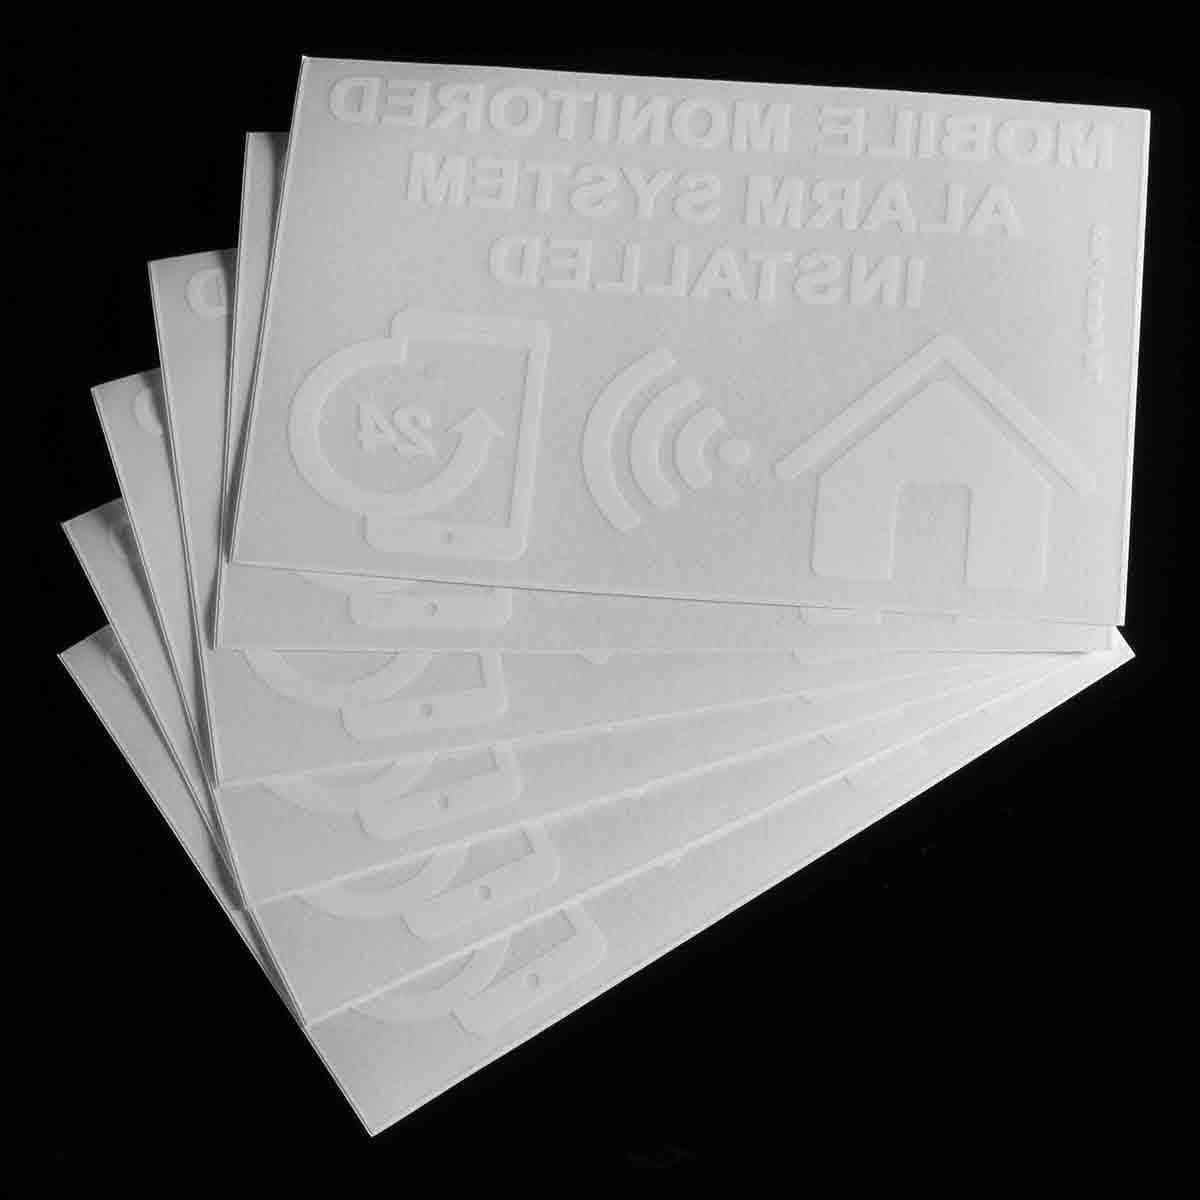 Monitored Alarm System Installed Warning Sign Internal Sticker